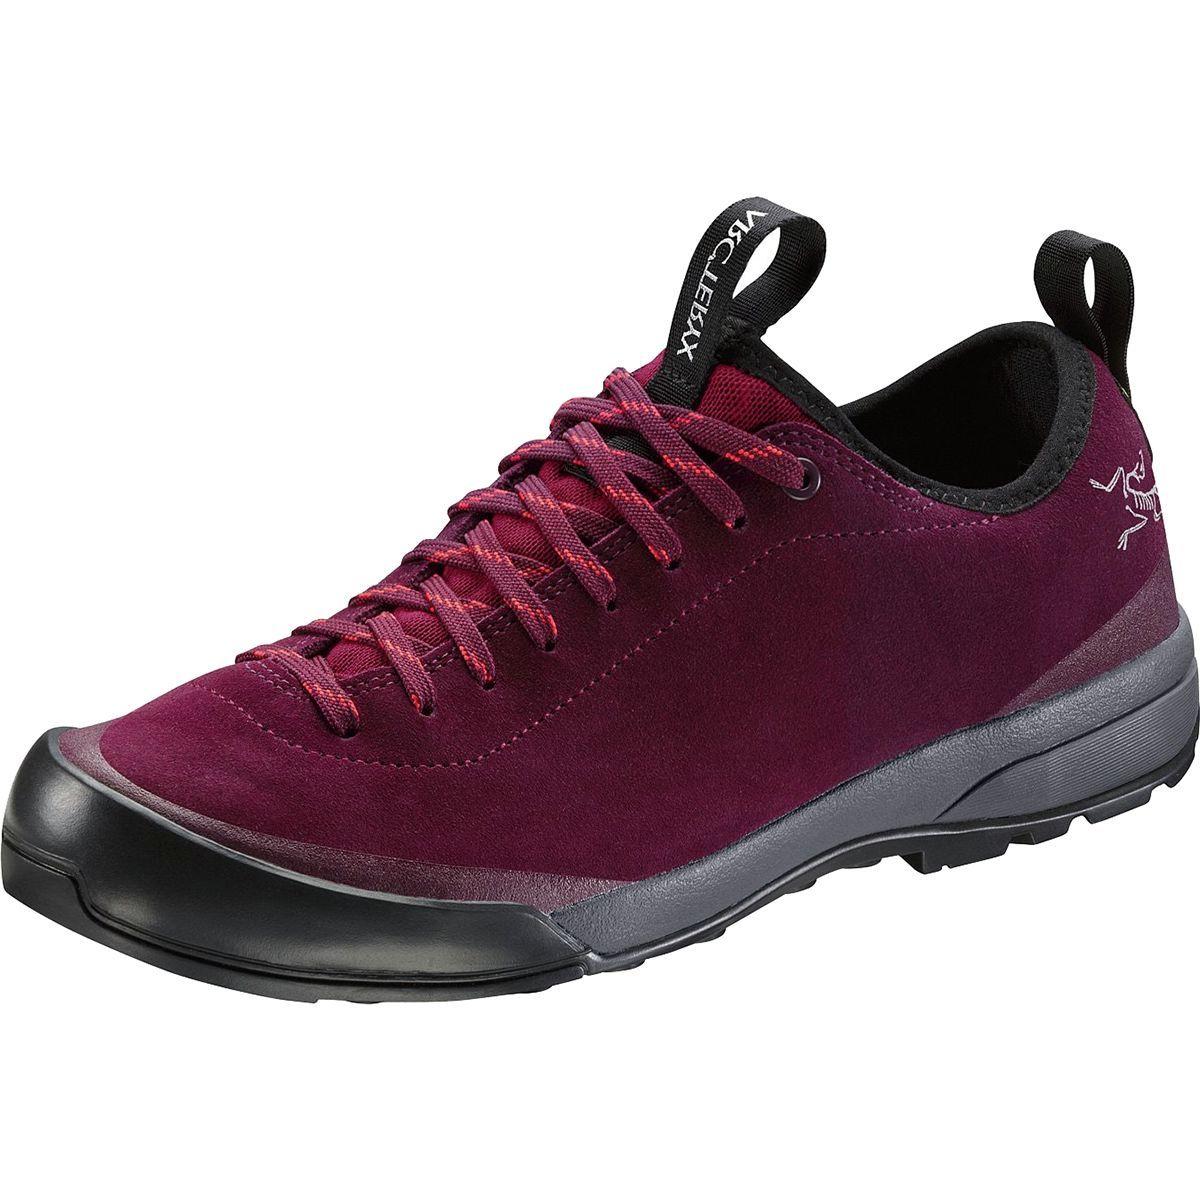 Arc'teryx Acrux SL Leather GTX Approach Shoe - Women's